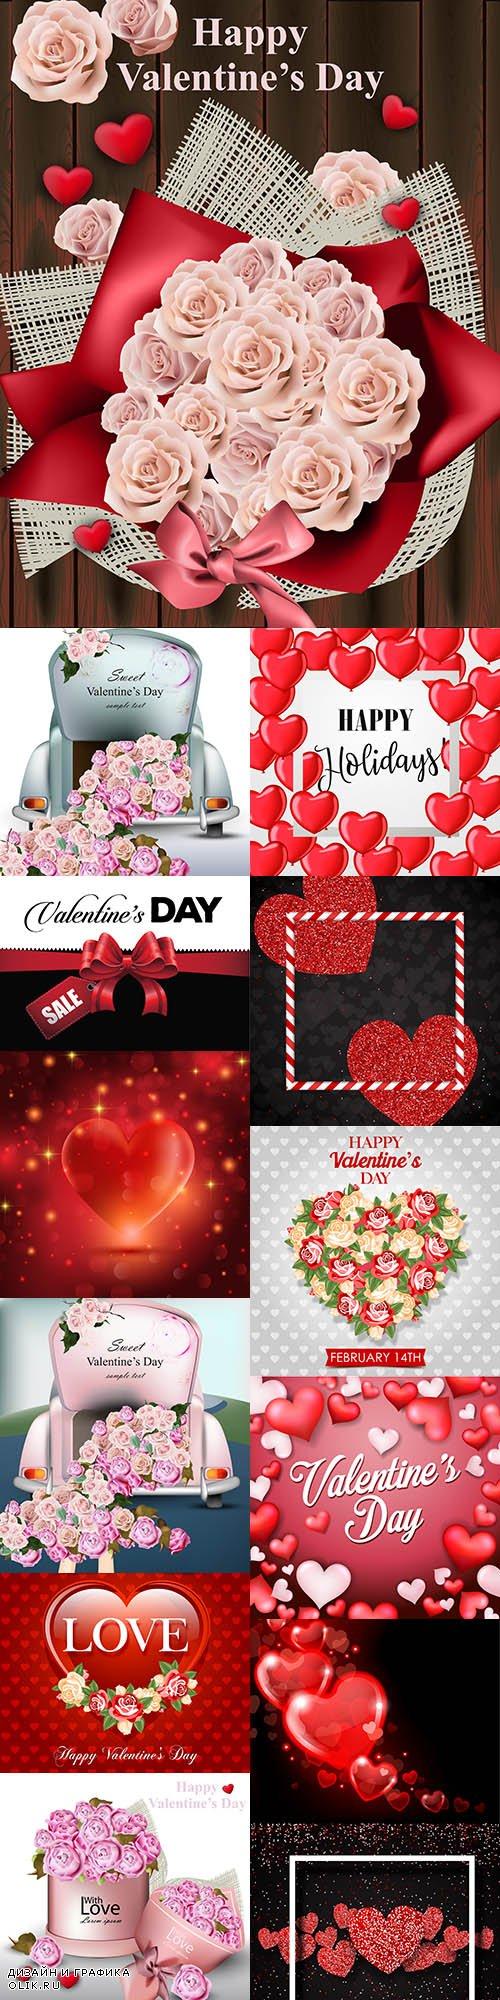 Happy Valentine's Day romantic decorative illustrations 26